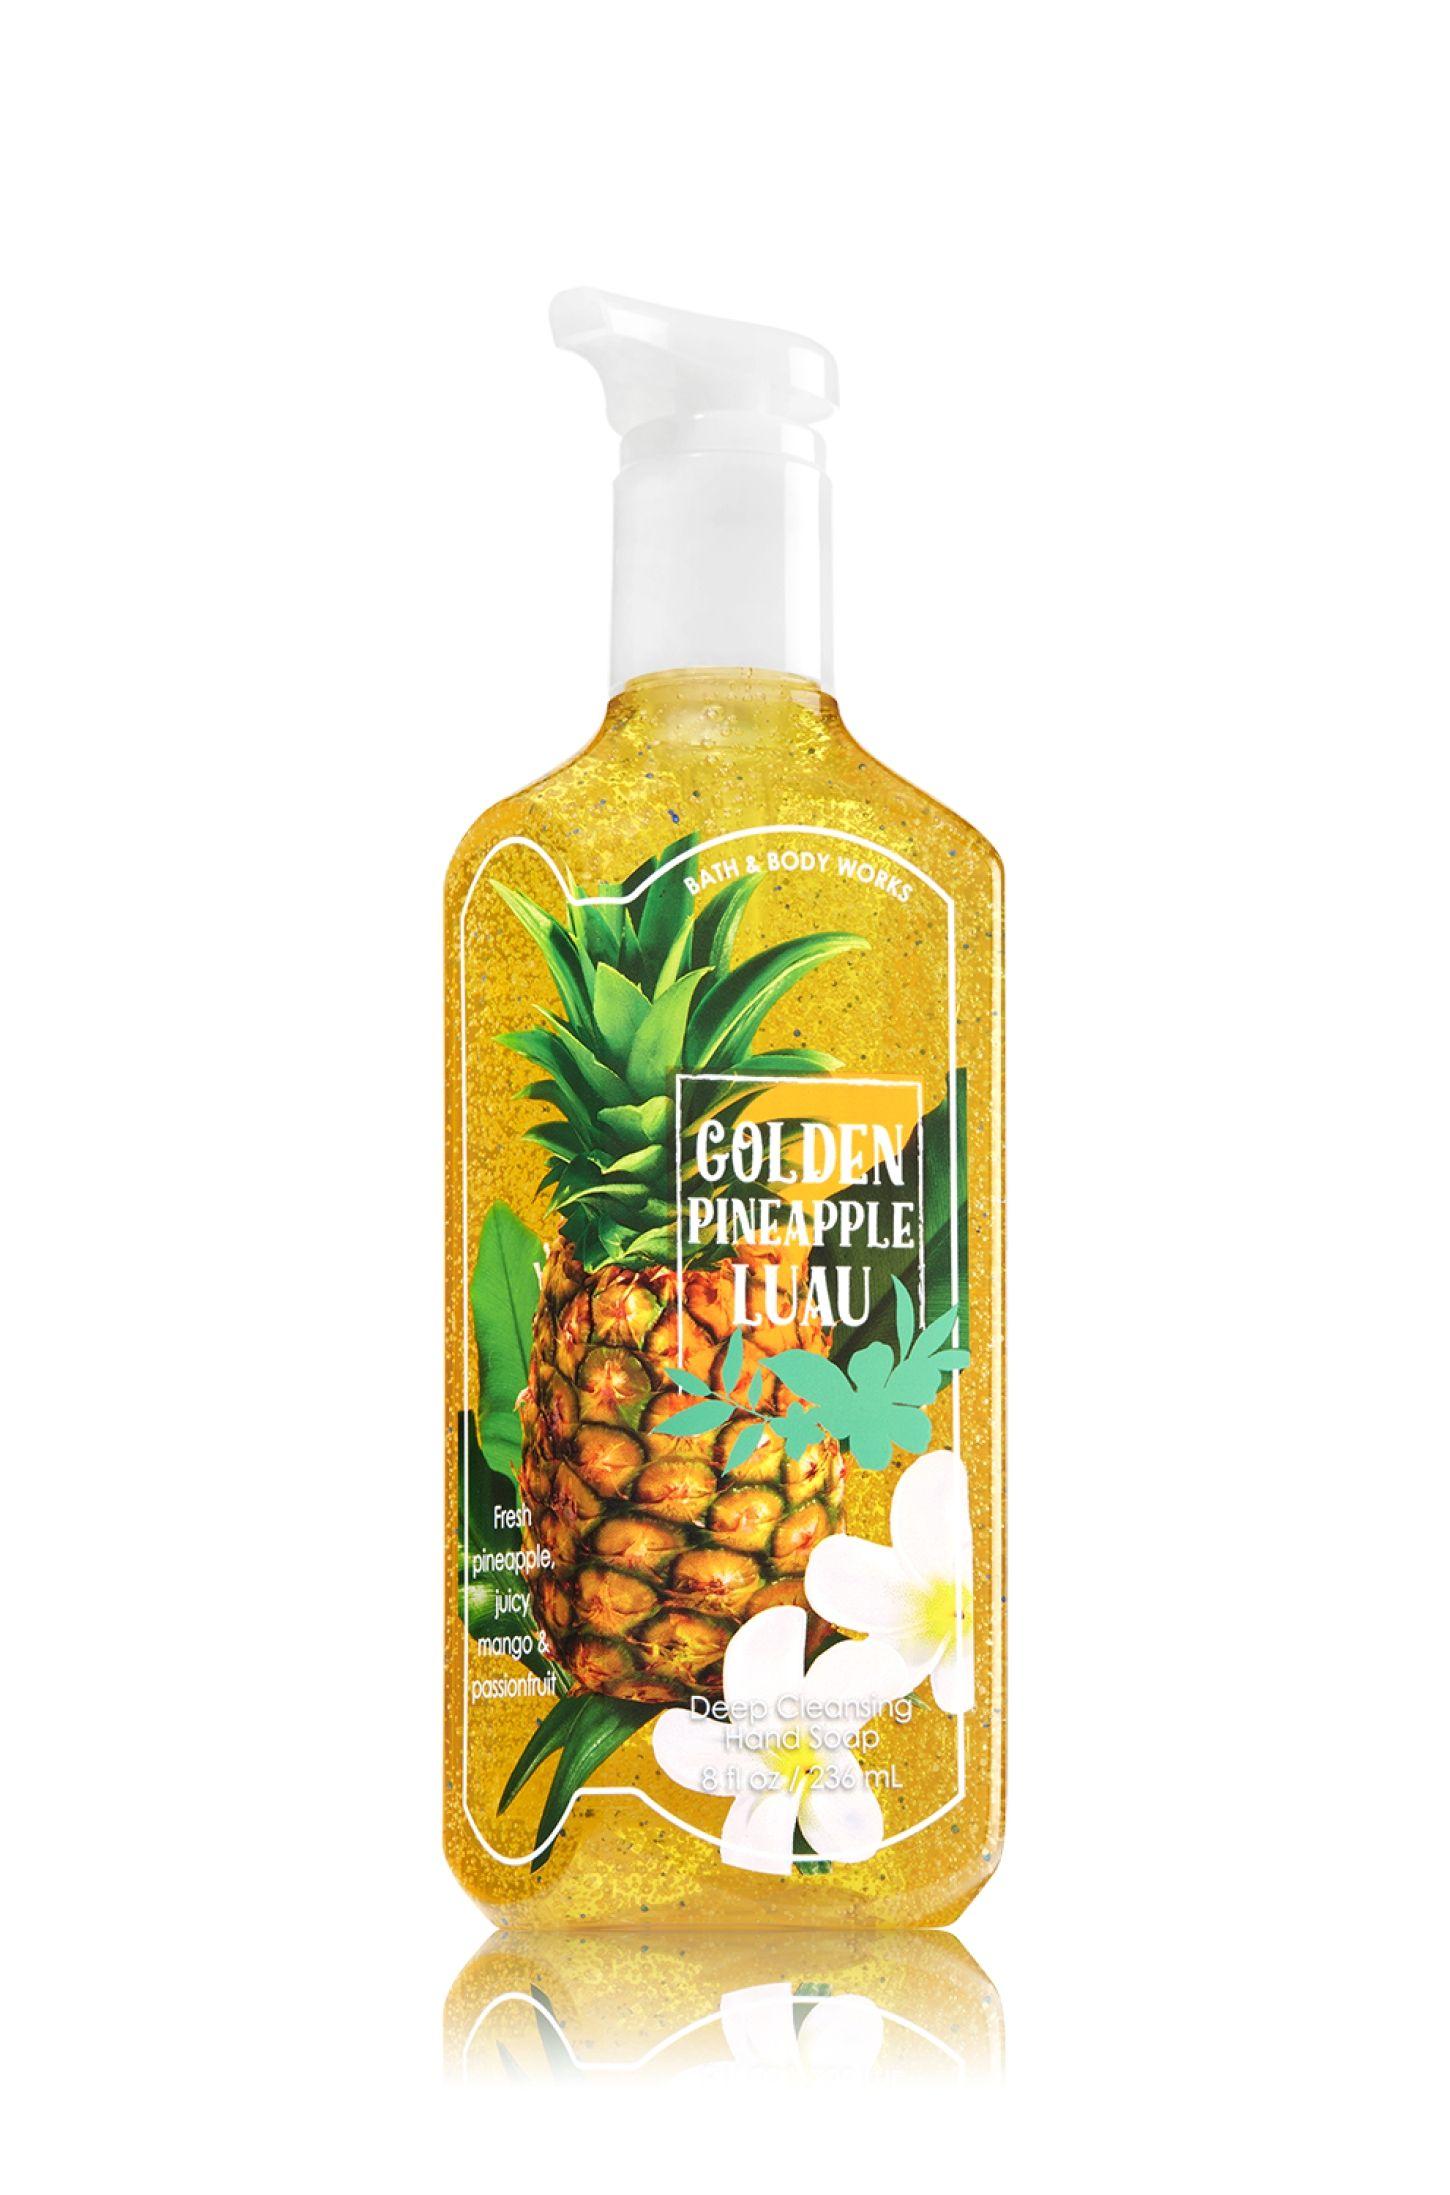 Golden Pineapple Luau Deep Cleansing Soap Soap Sanitizer Bath